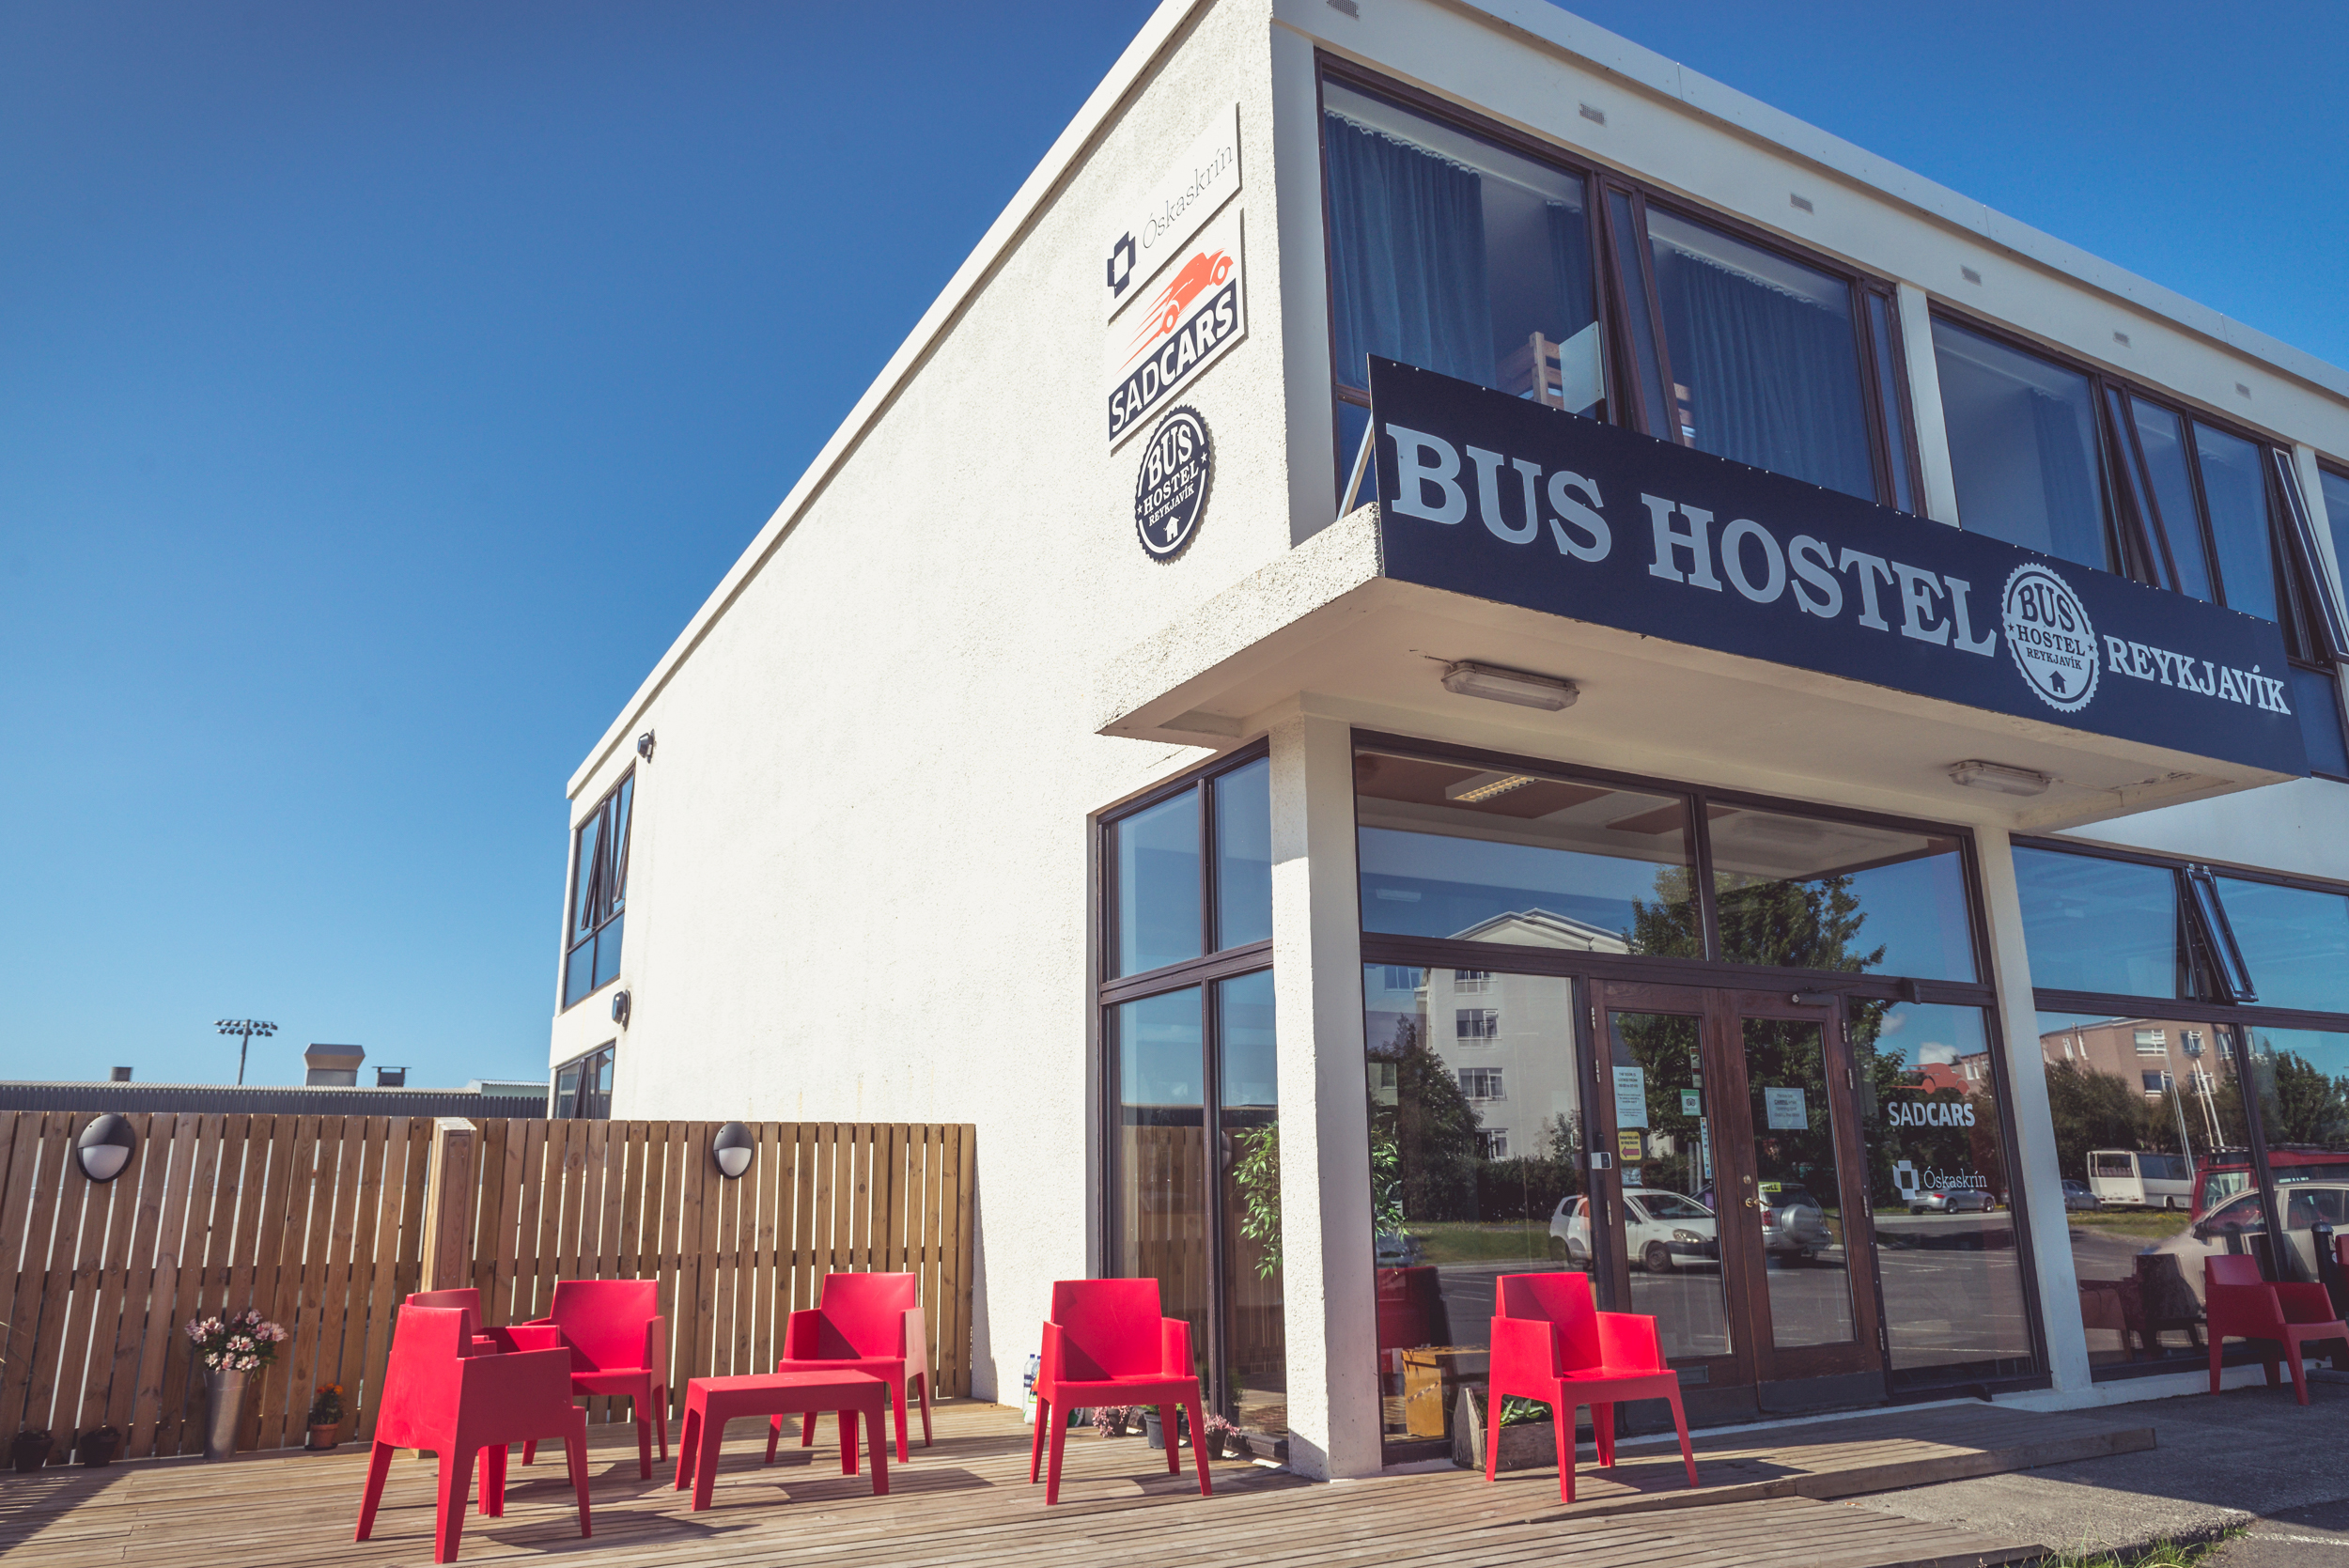 HOSTEL - Bus Hostel Reykjavik